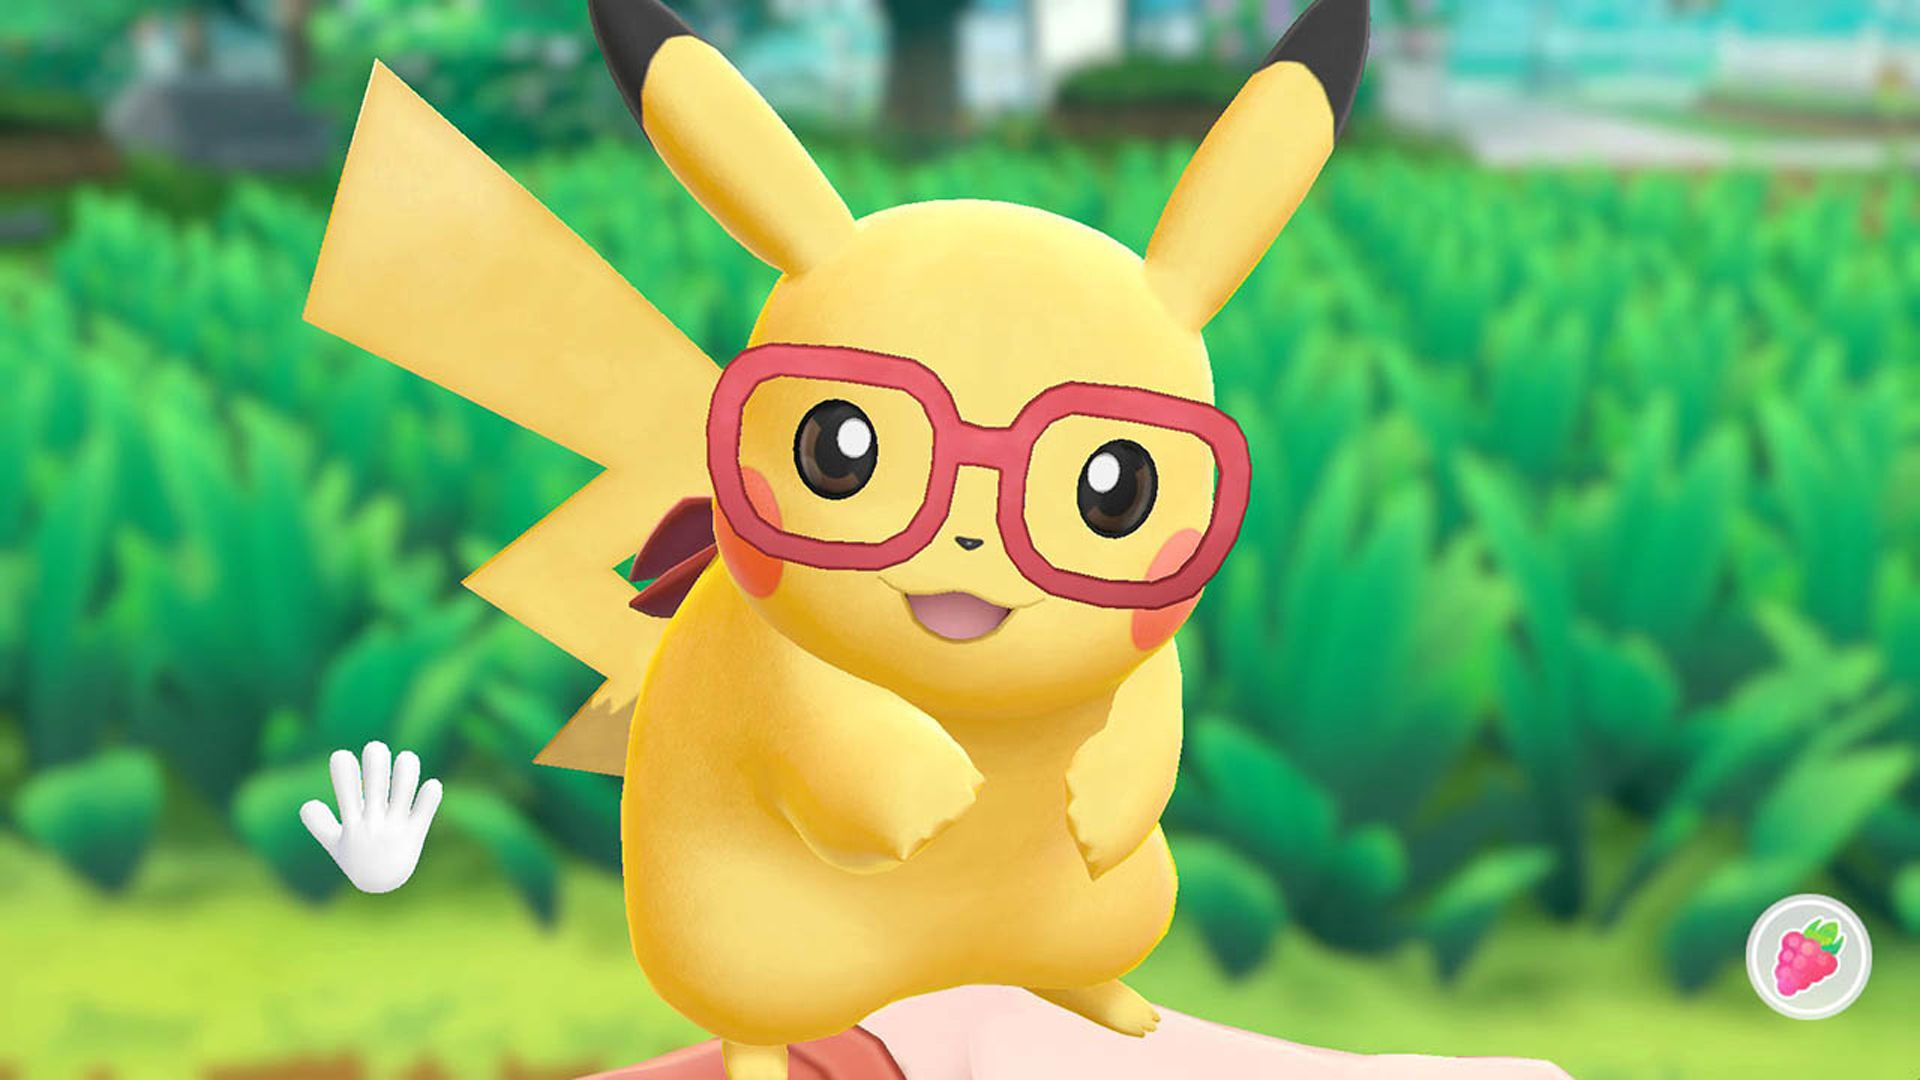 How To Transfer Pokemon To Nintendo Switch